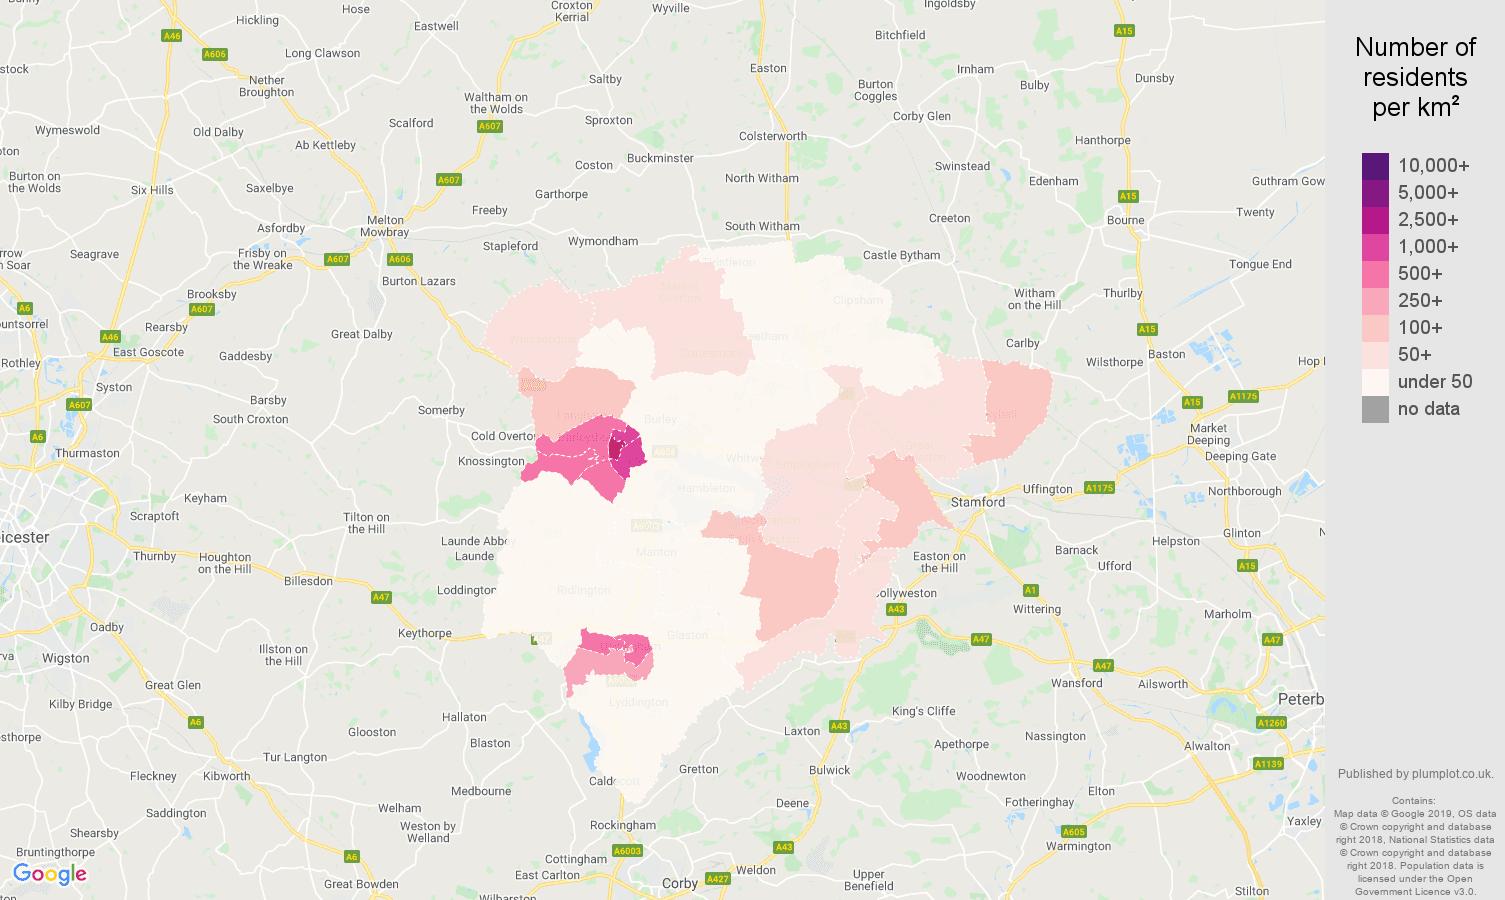 Rutland population density map